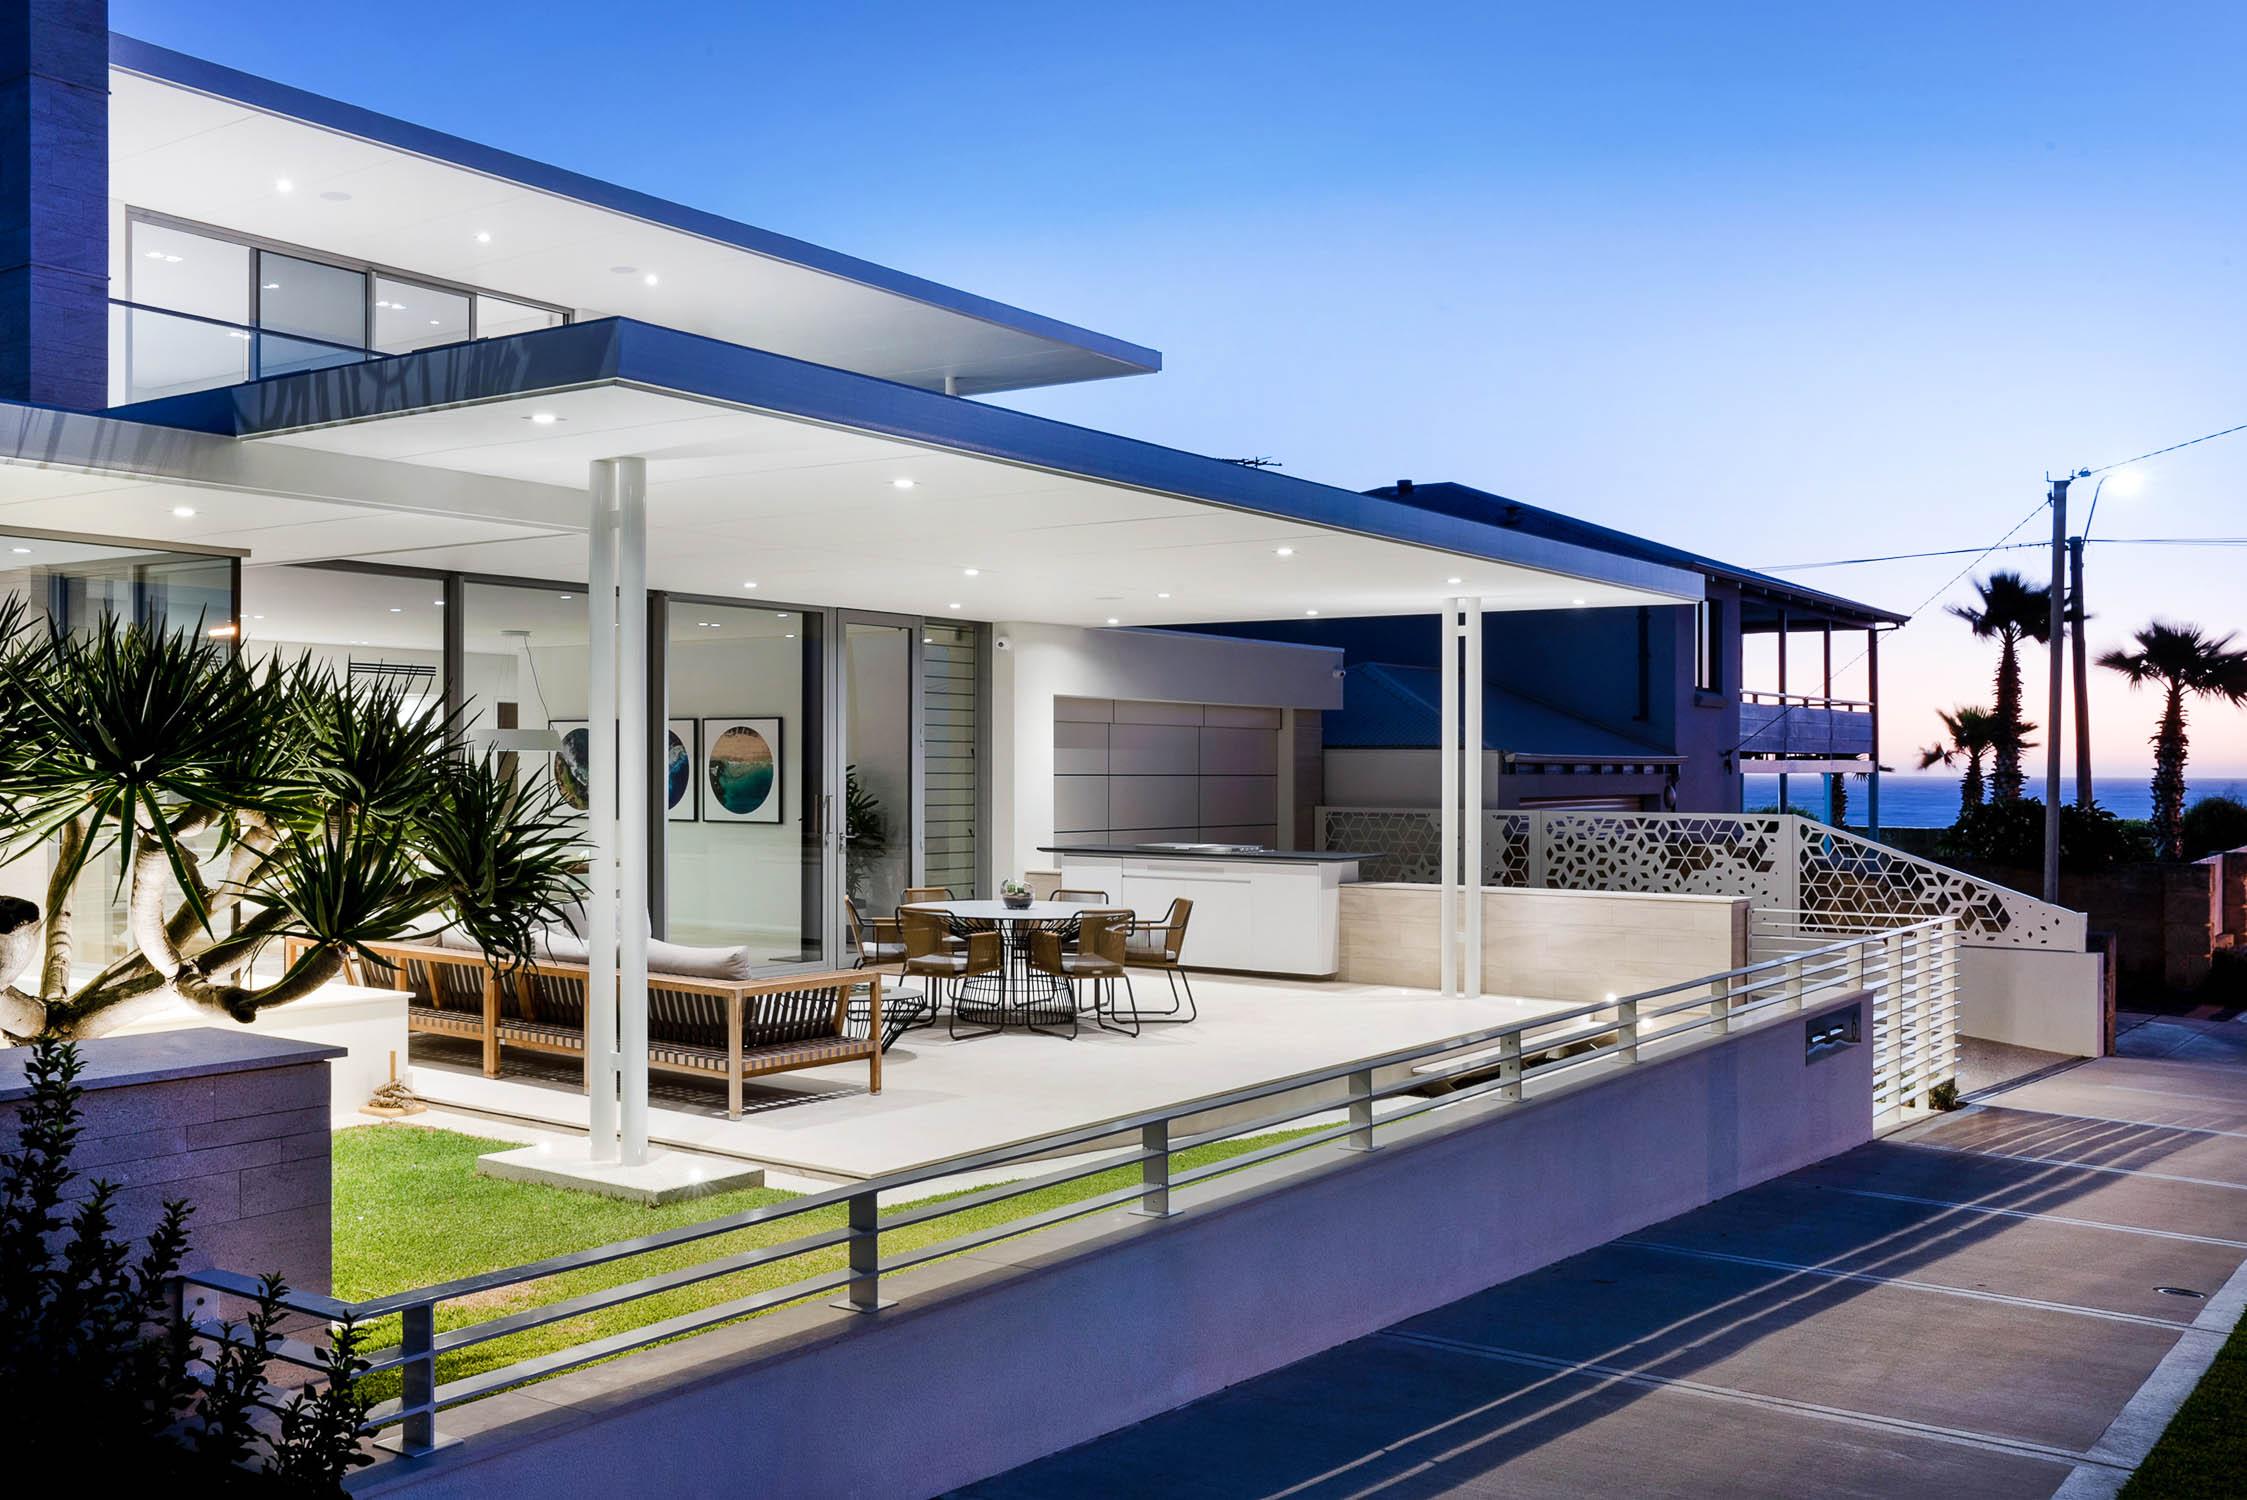 custom built homes    VIEW